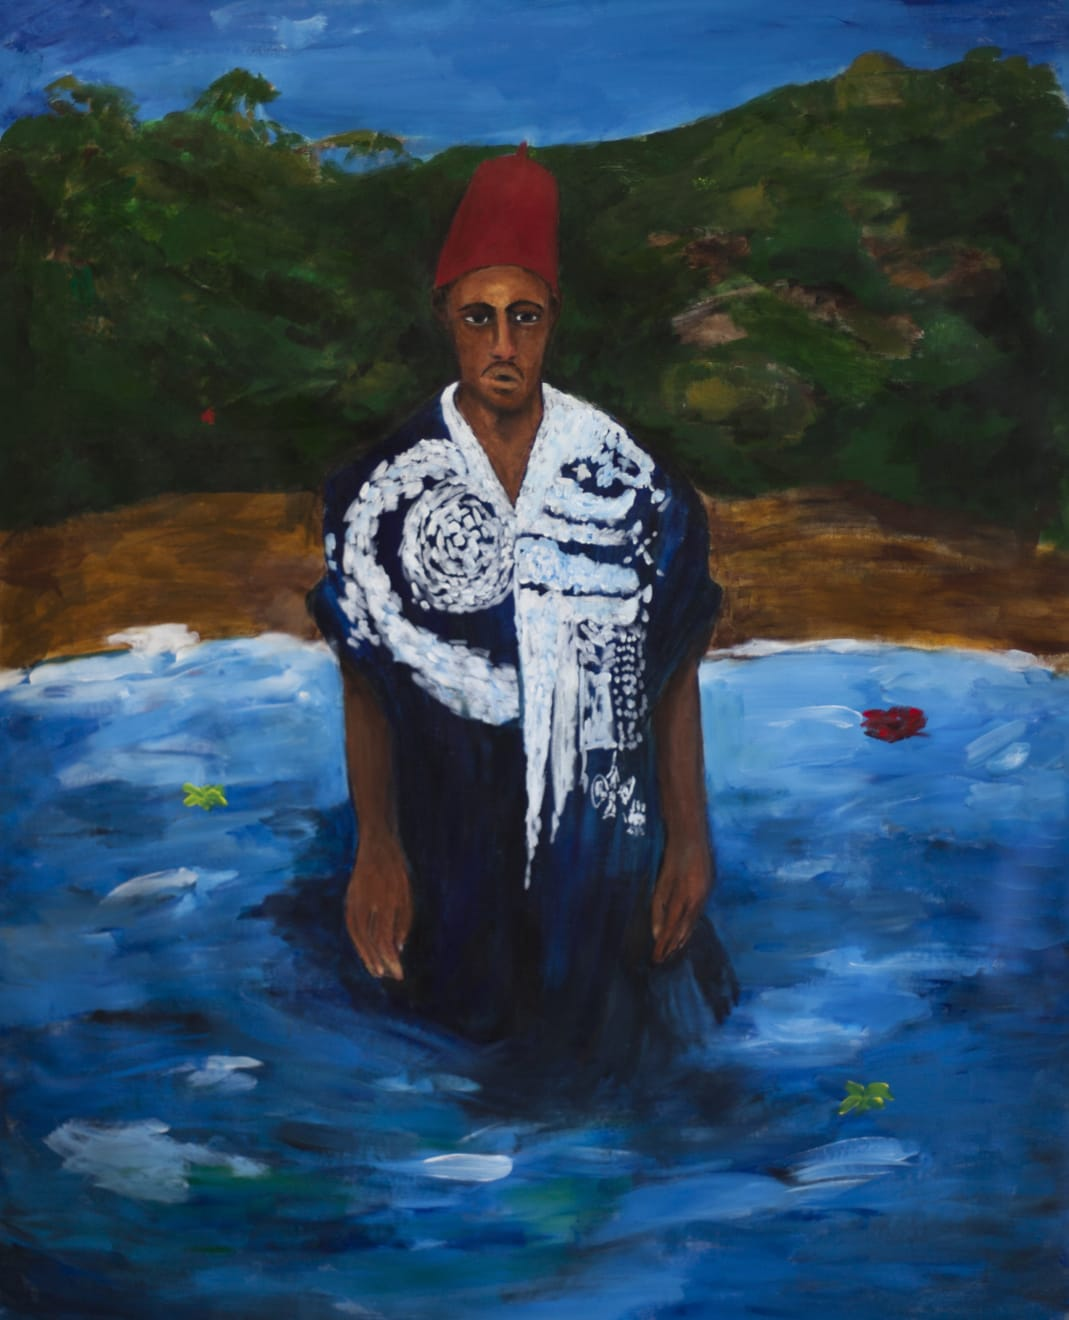 Anuar Khalifi, Mawqif, 2020, Acrylic on canvas, 145 x 114cm EUR 9,000 (Excluding VAT)